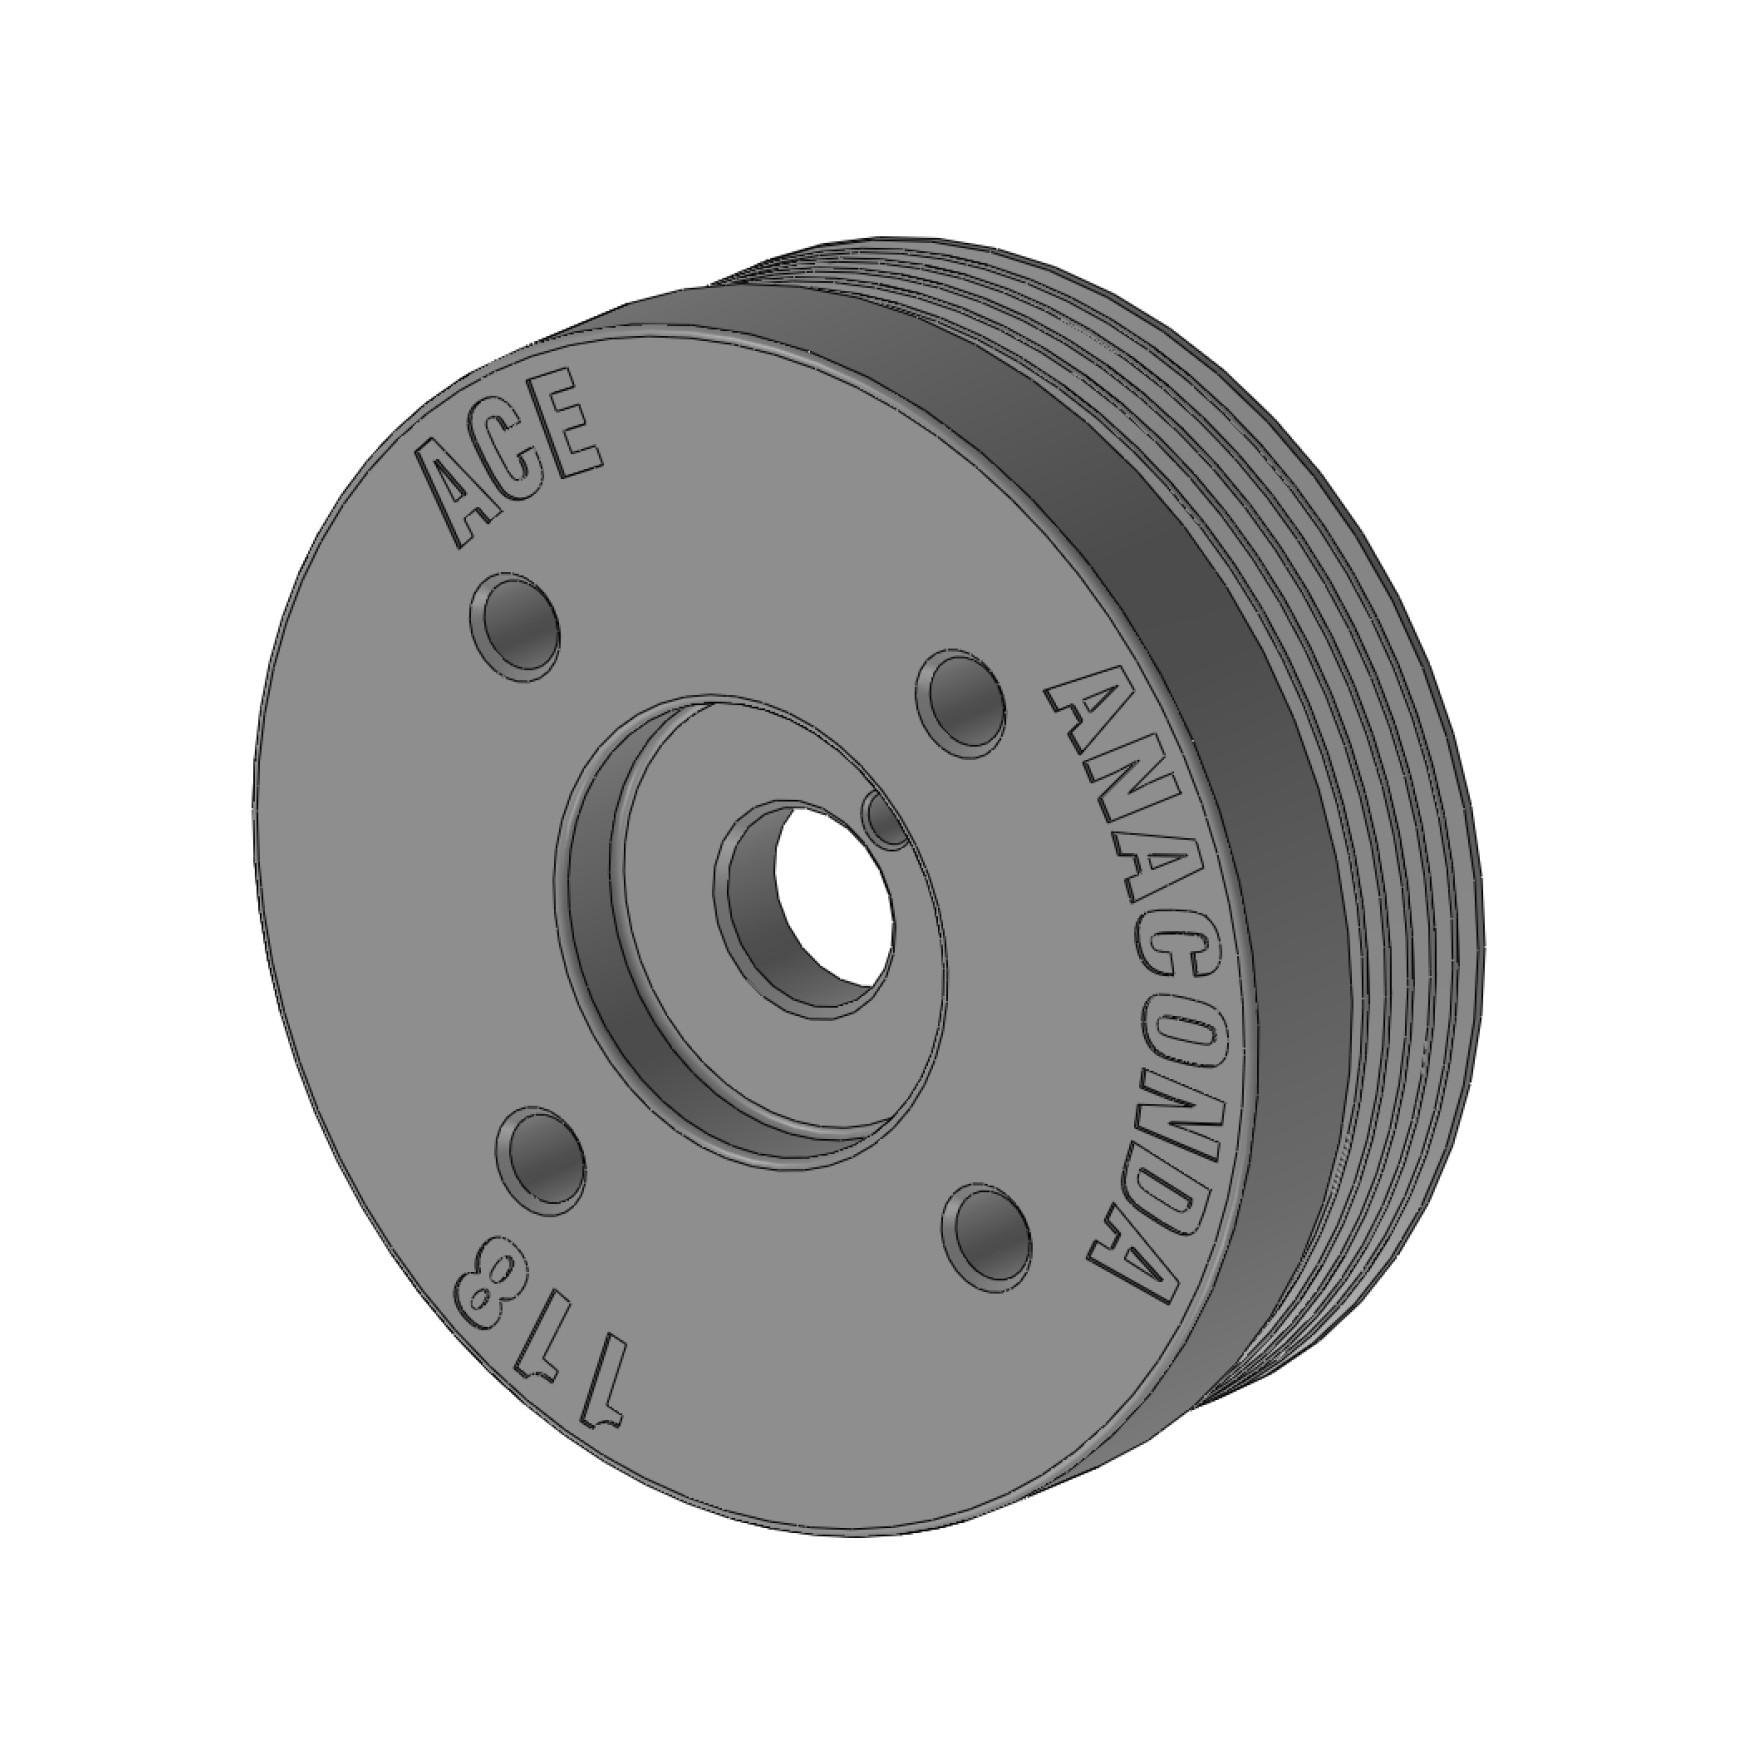 ACE Merge Header - Engine Crank Pulley - 118mm Diameter - Subaru BRZ / Scion FR-S / Toyota GT86